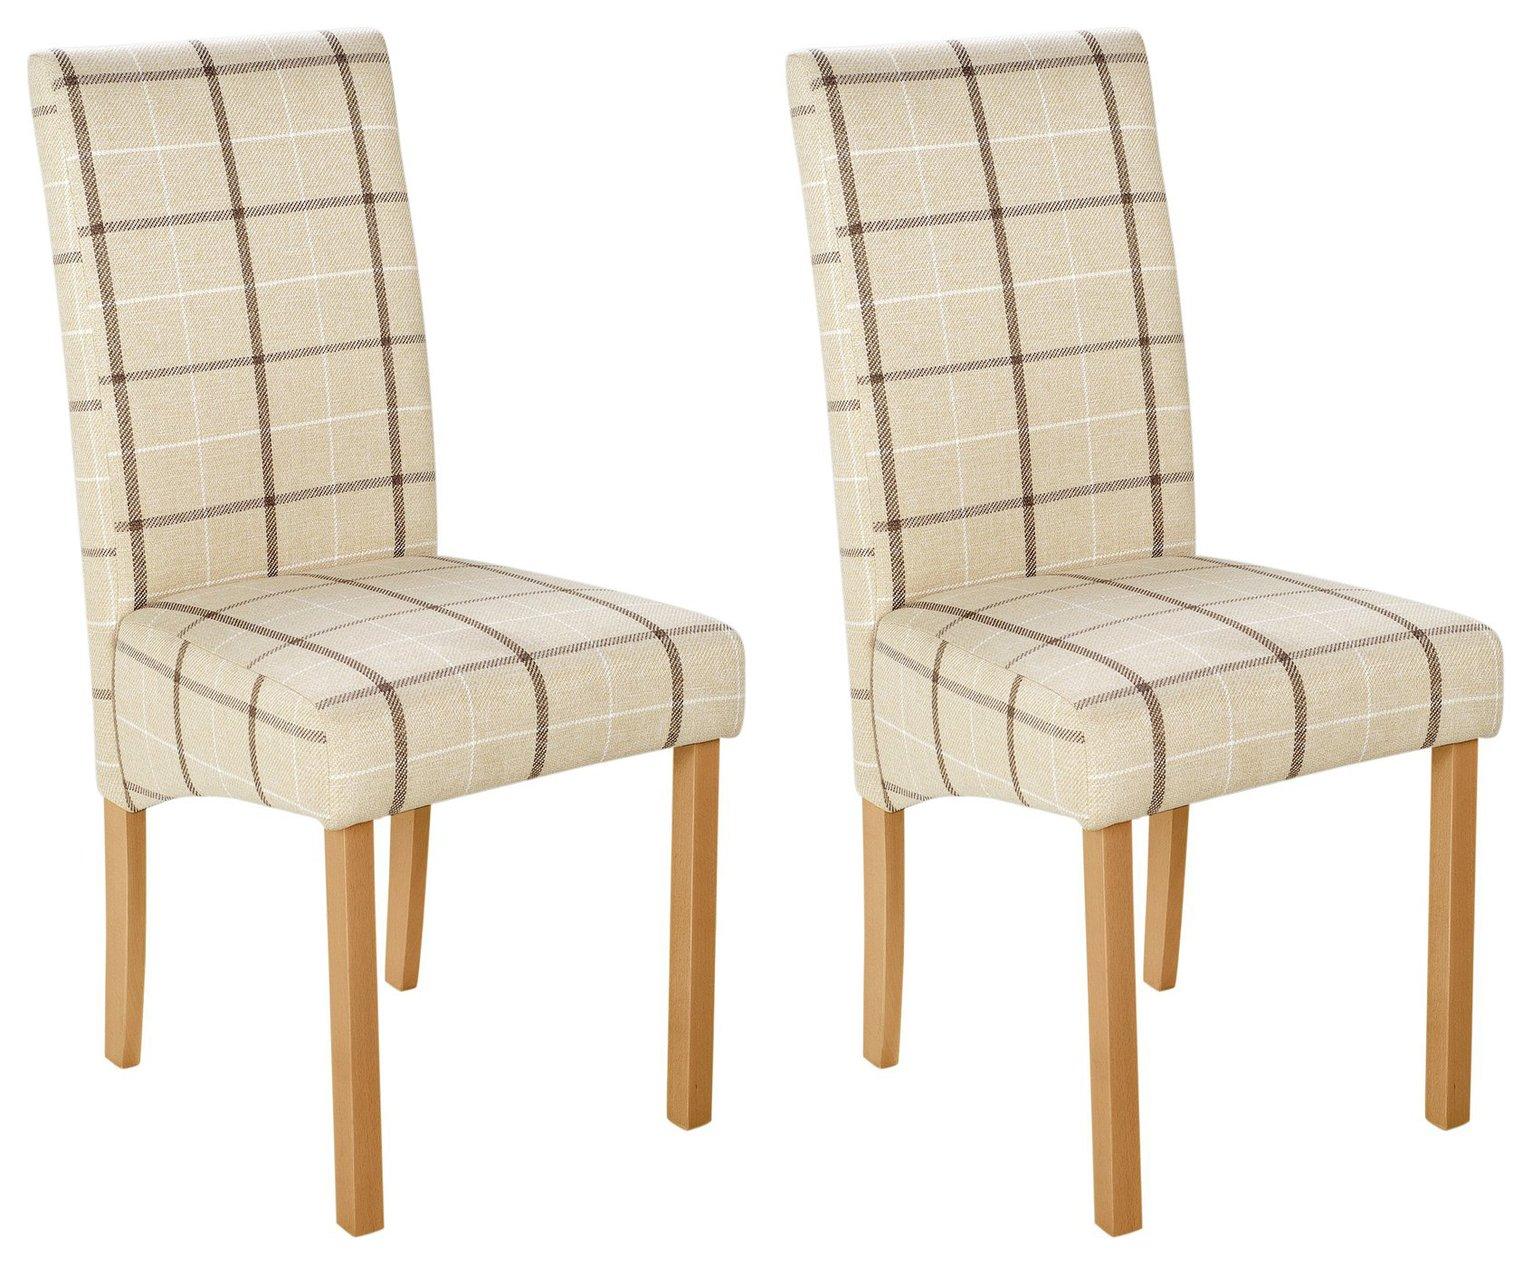 Argos Home Pair of Fabric Skirted Chairs - Cream Check